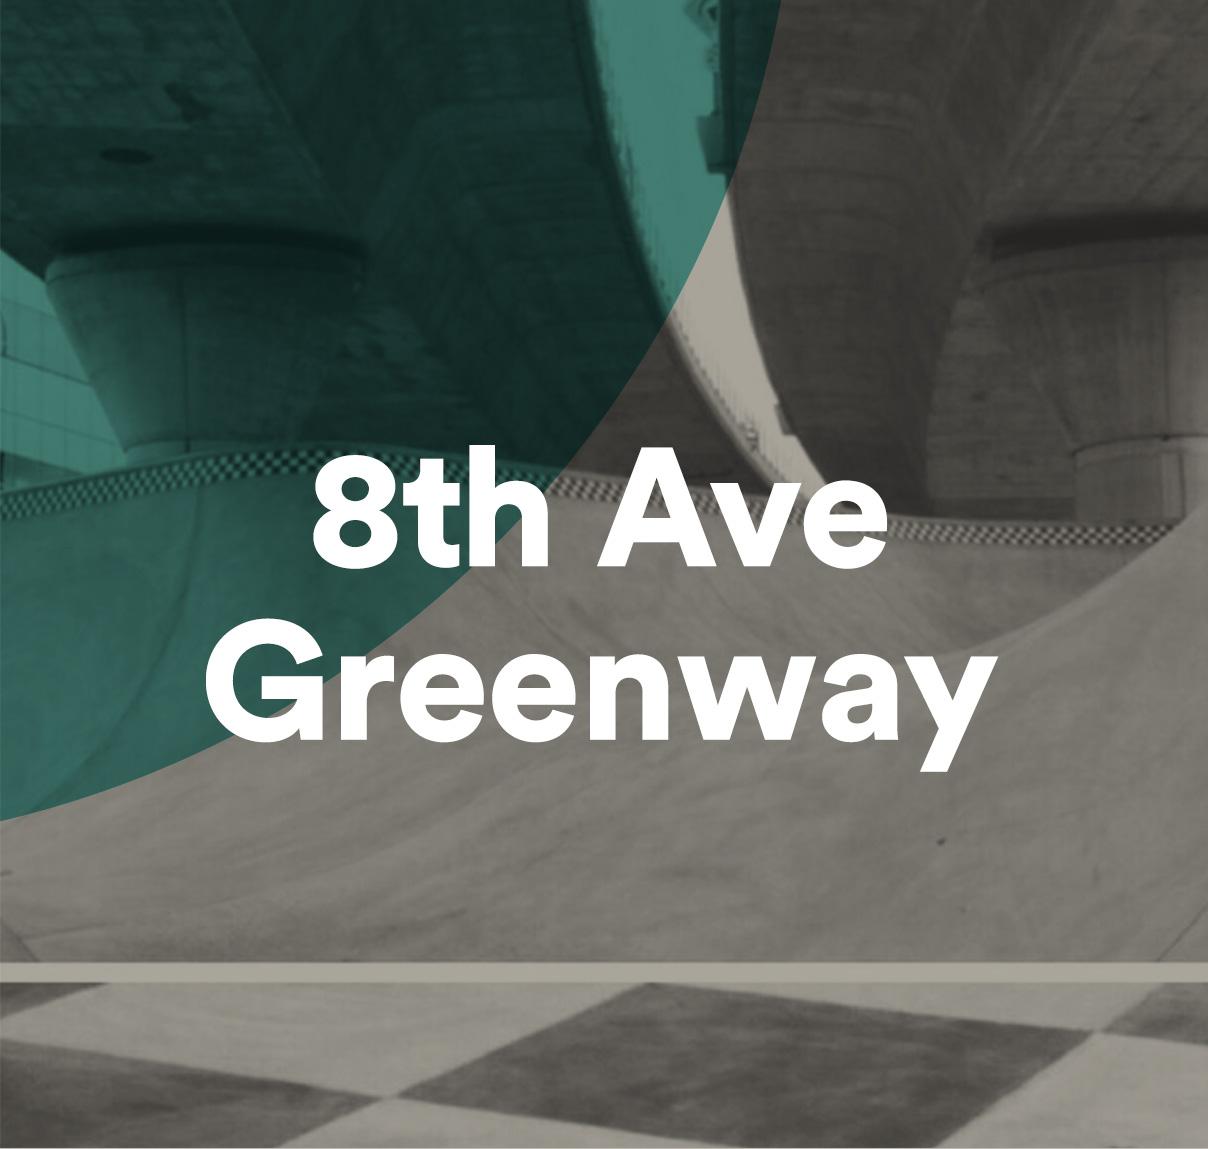 projects_thumbs_greenway.jpg